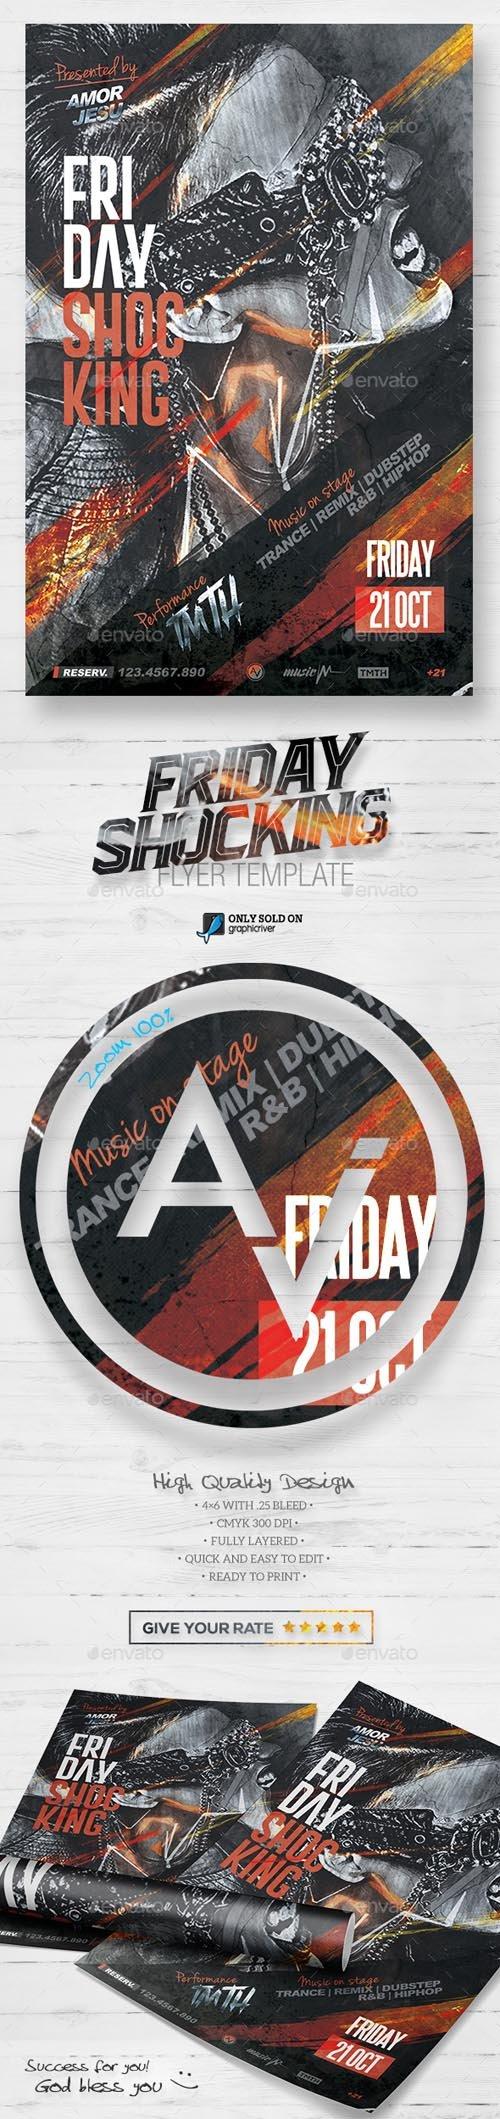 Friday Shocking Flyer Template V2 15691869